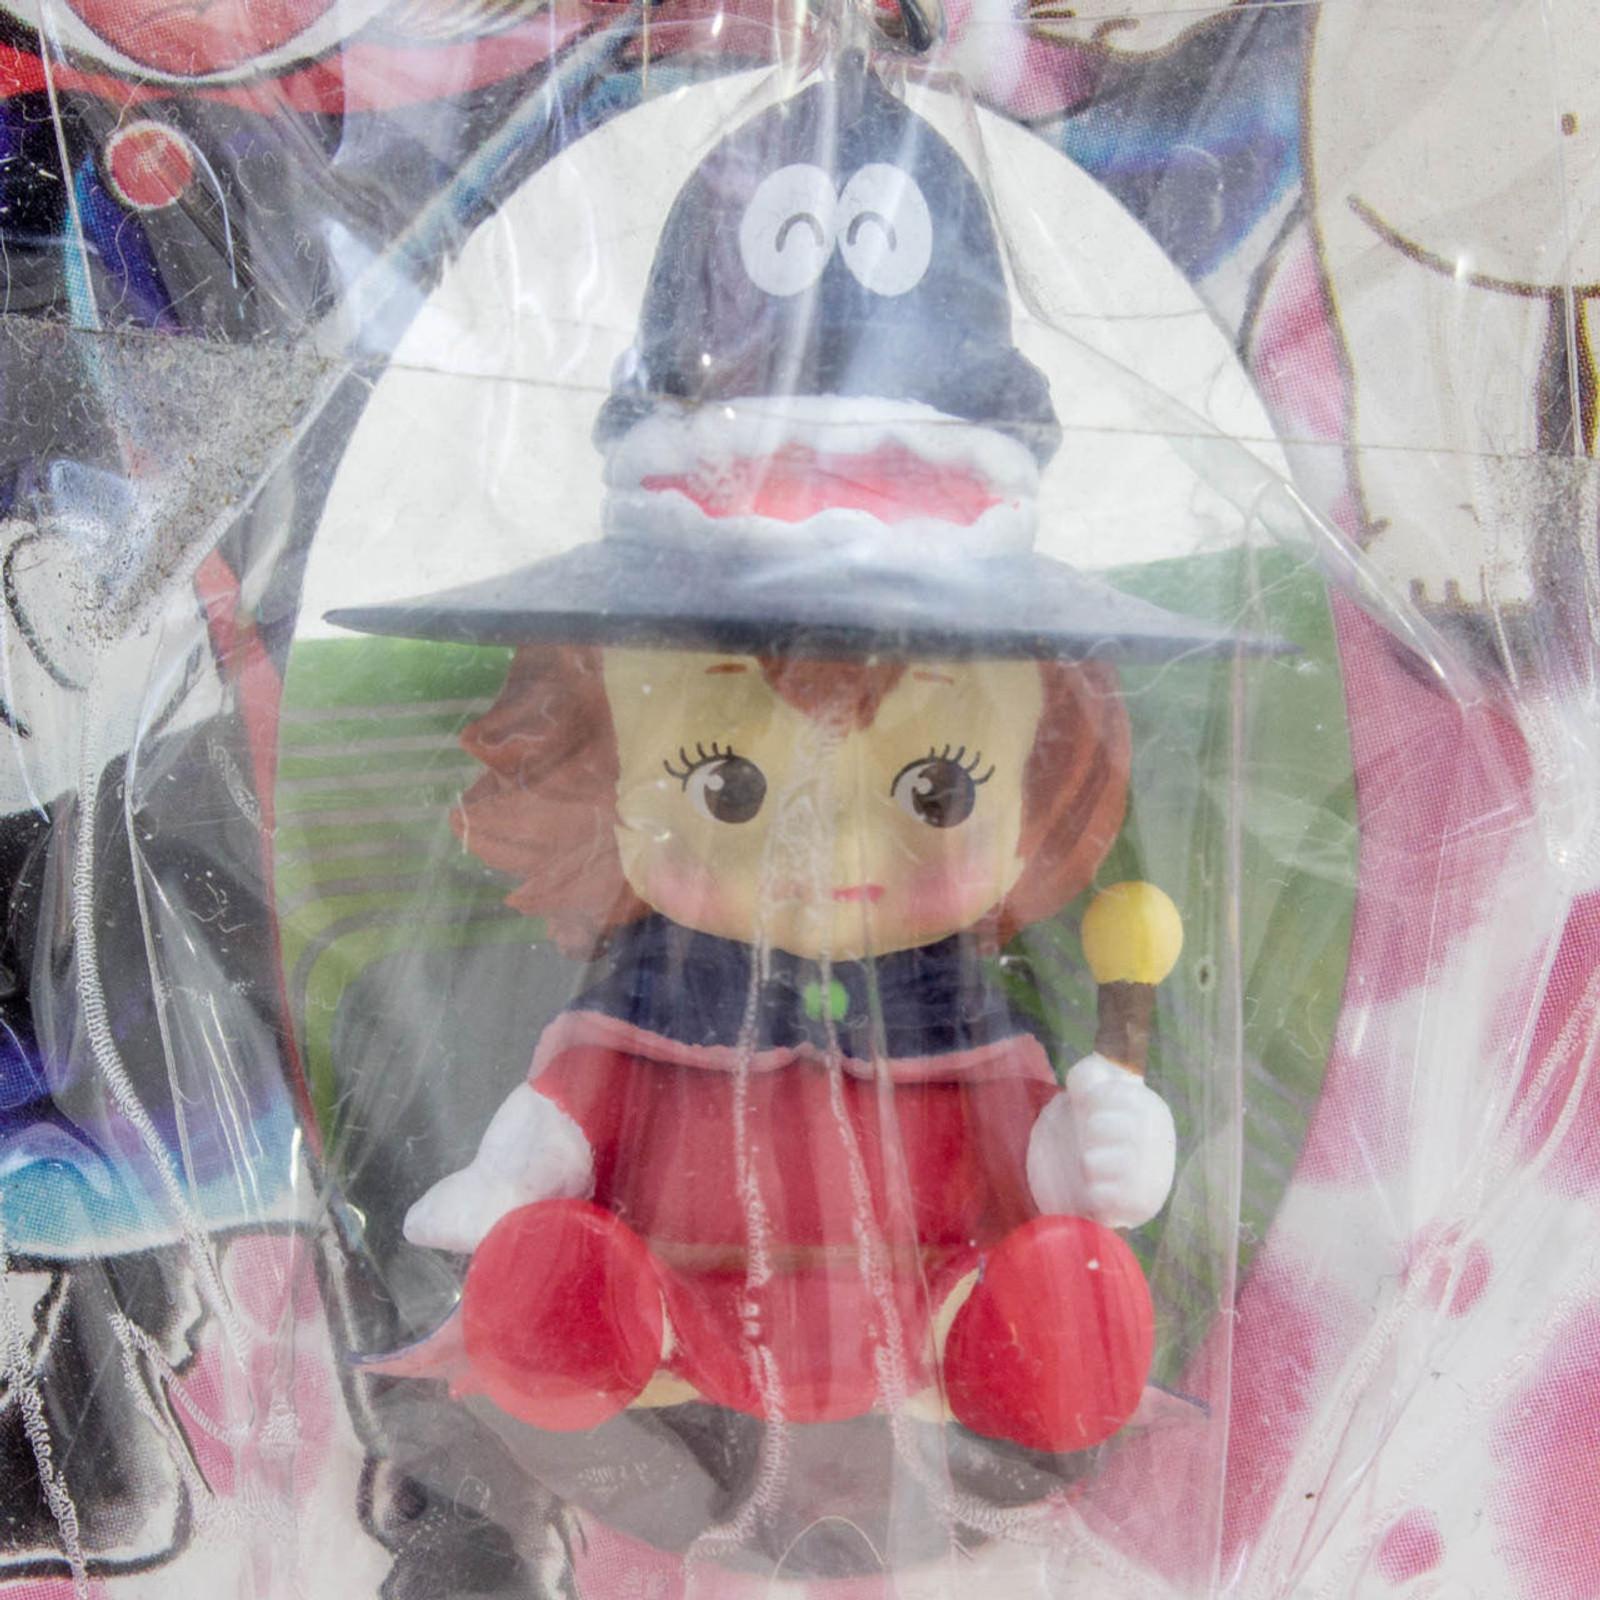 Dororon Enma-Kun Rose O'neill Kewpie Kewsion Figure Strap JAPAN ANIME